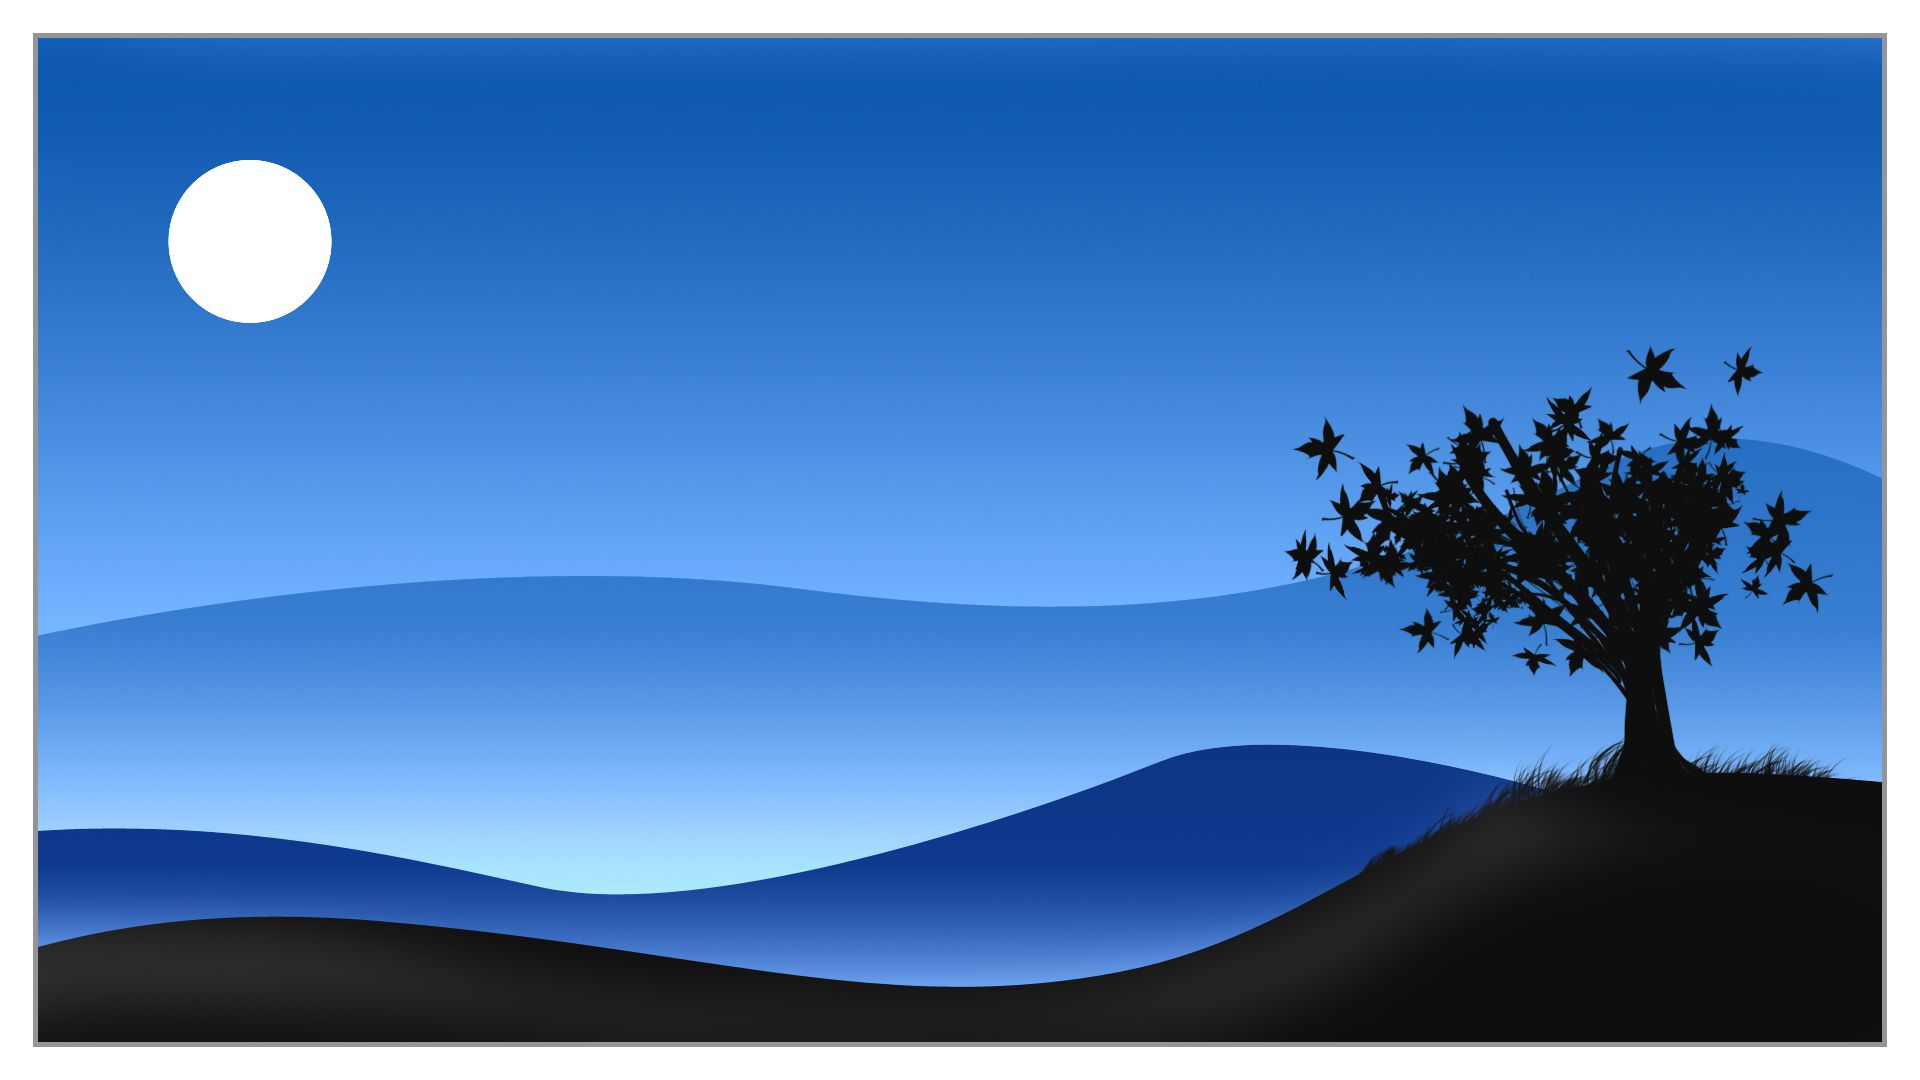 Simple Digital Art Landscape Hd Wallpaper 1920x1080 Sunset Art Landscape Wallpaper Art Background